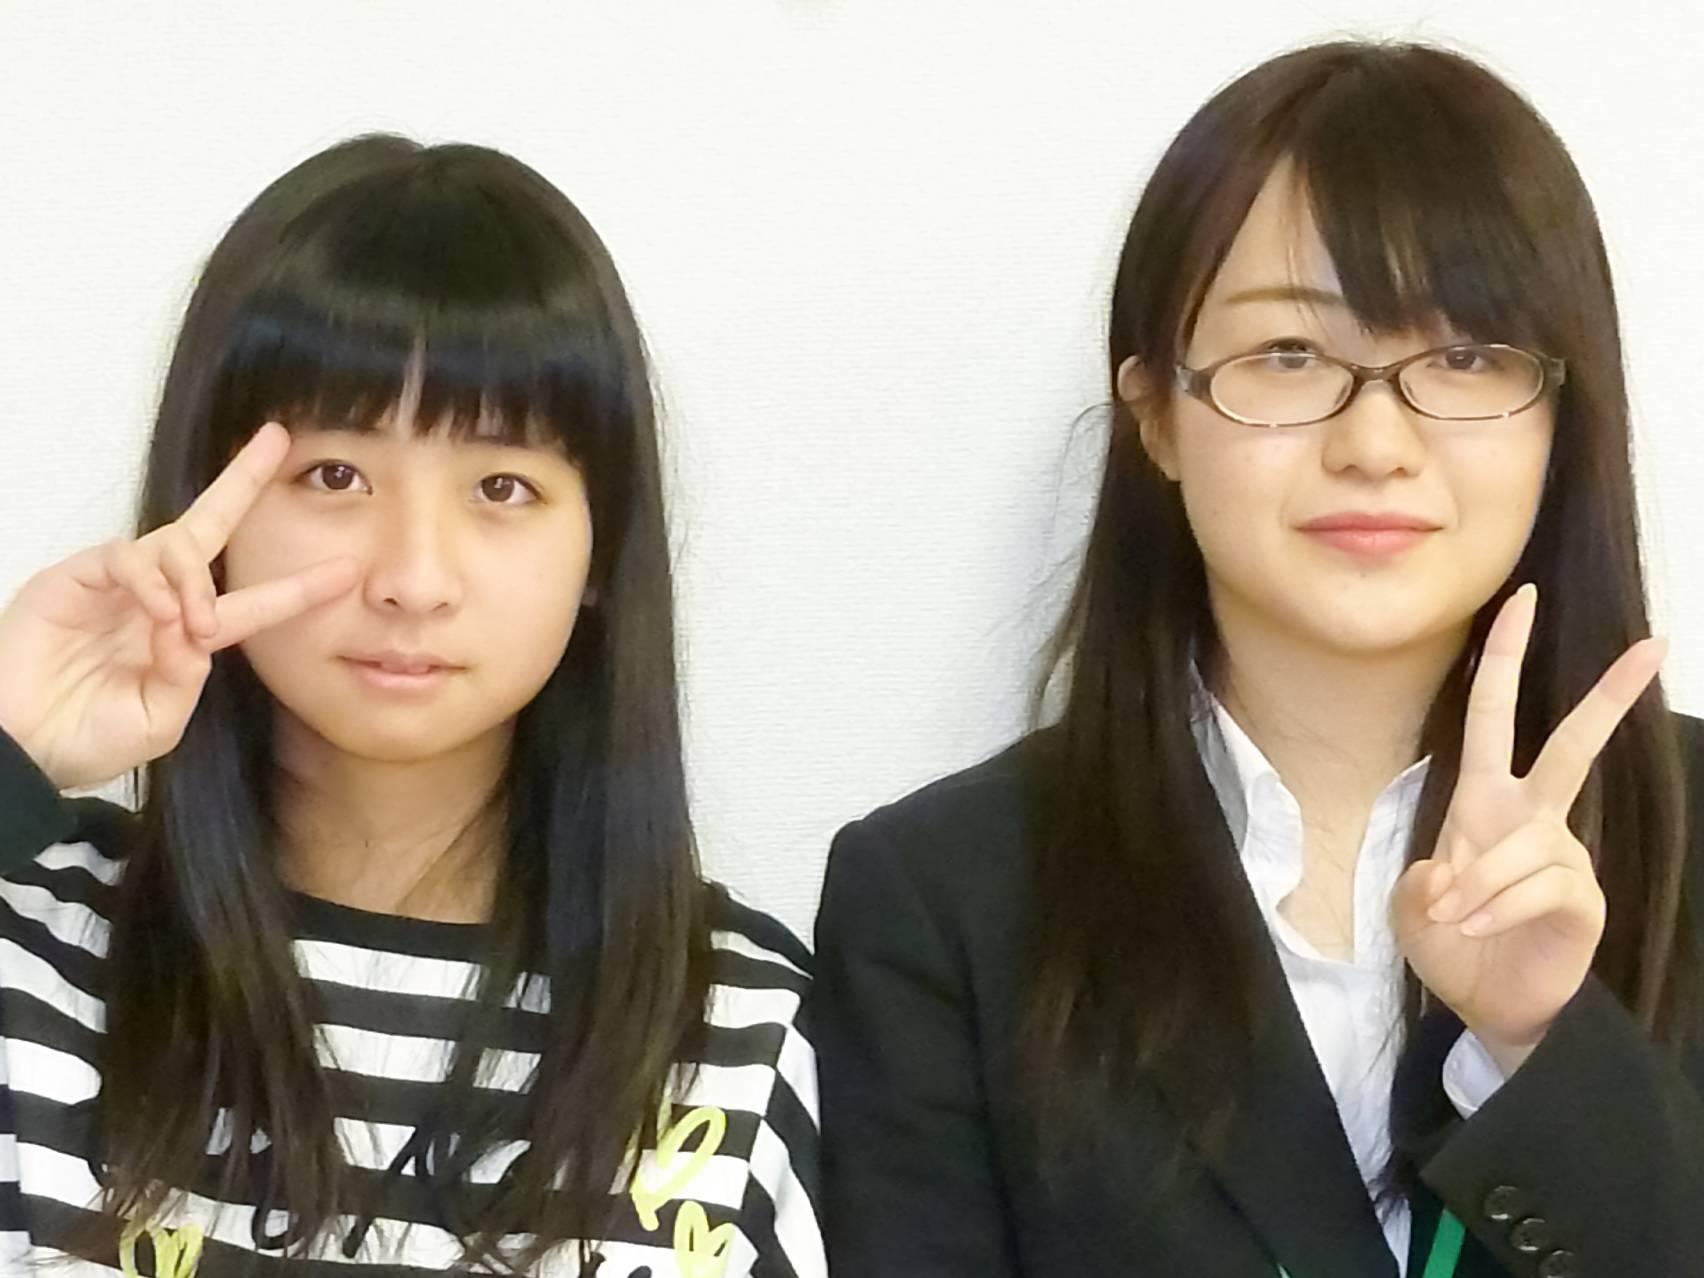 H29春 中学2年 當山すずさん 中村先生